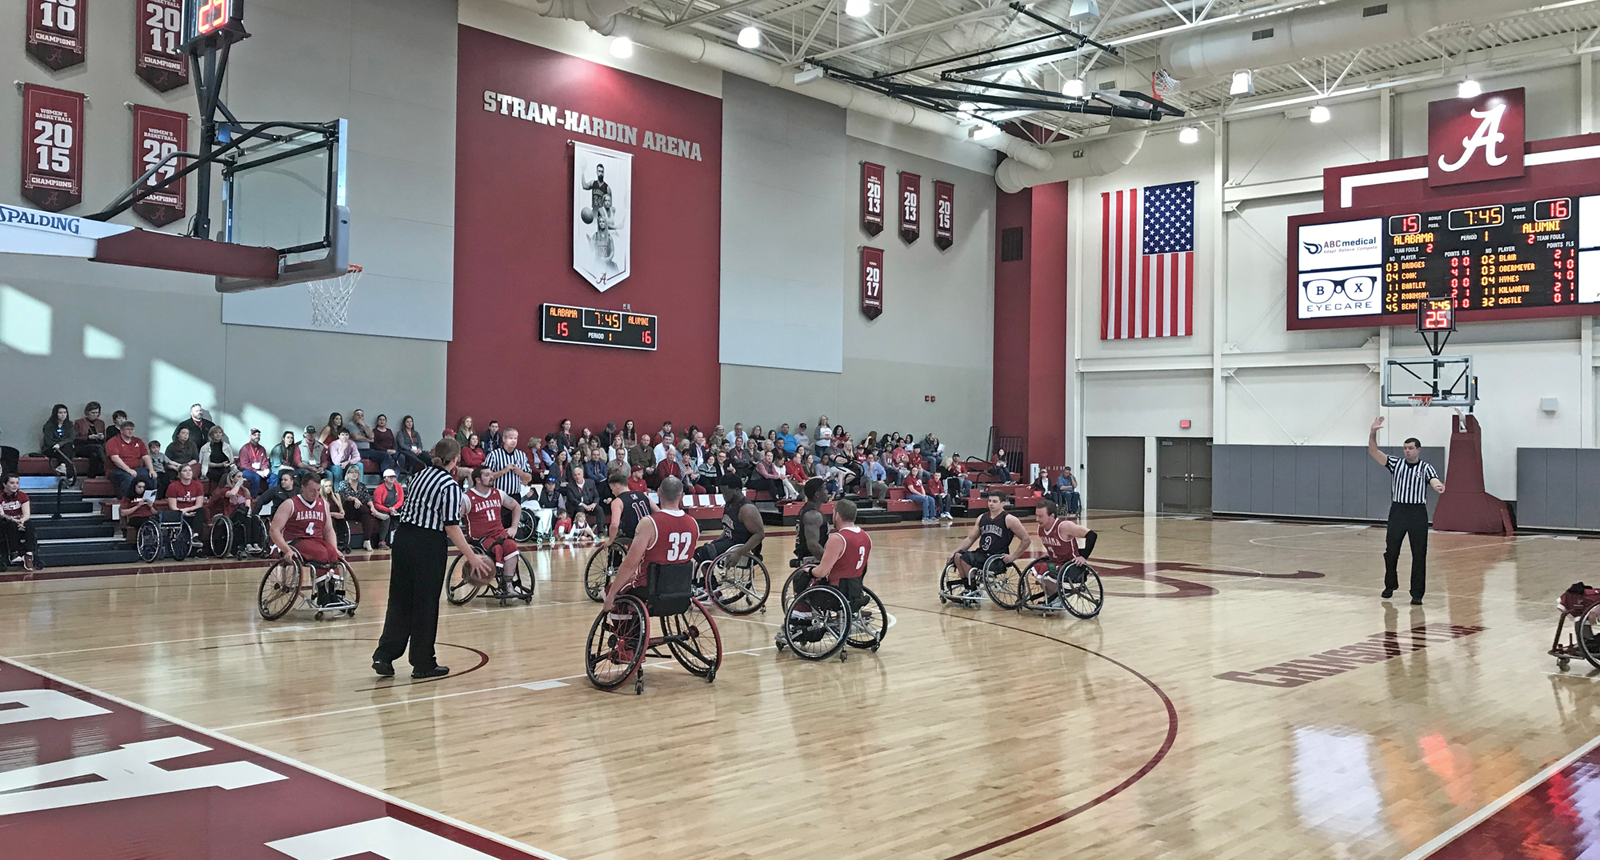 Stran Hardin Arena for Adapted Athletics at University of Alabama